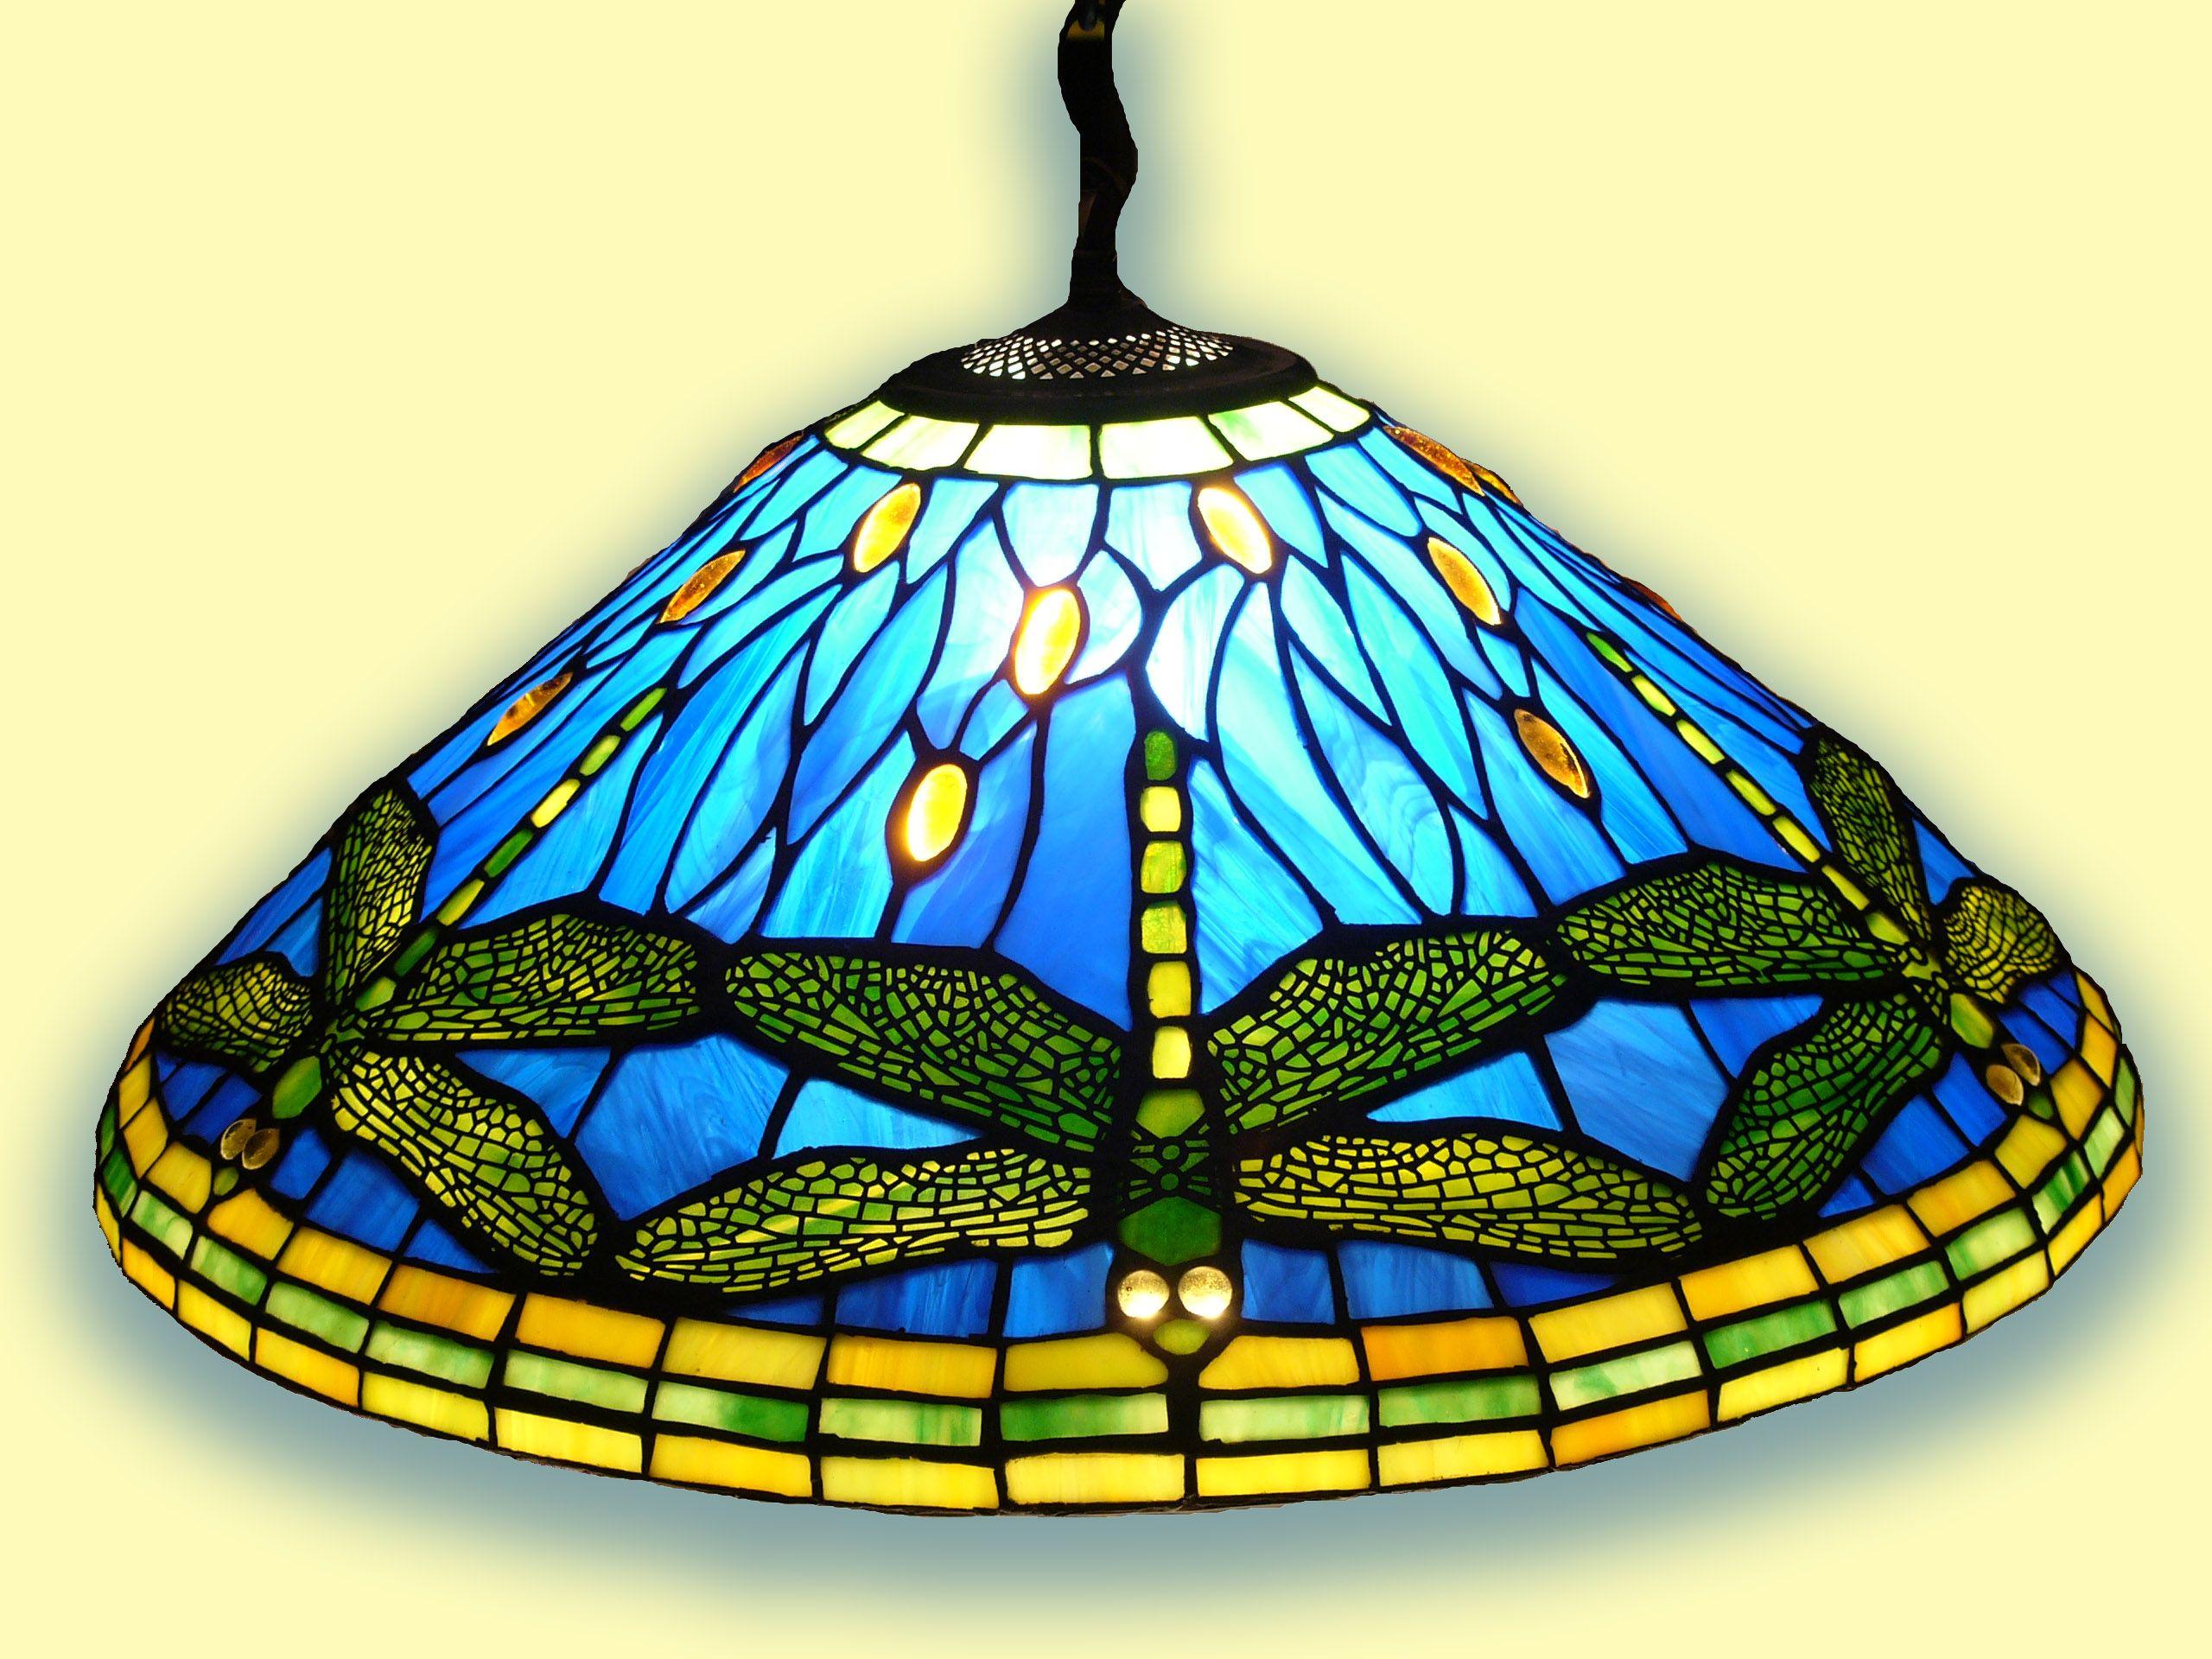 Dale tiffany floor lamps foter - Tiffany Lamp Wikipedia The Free Encyclopedia